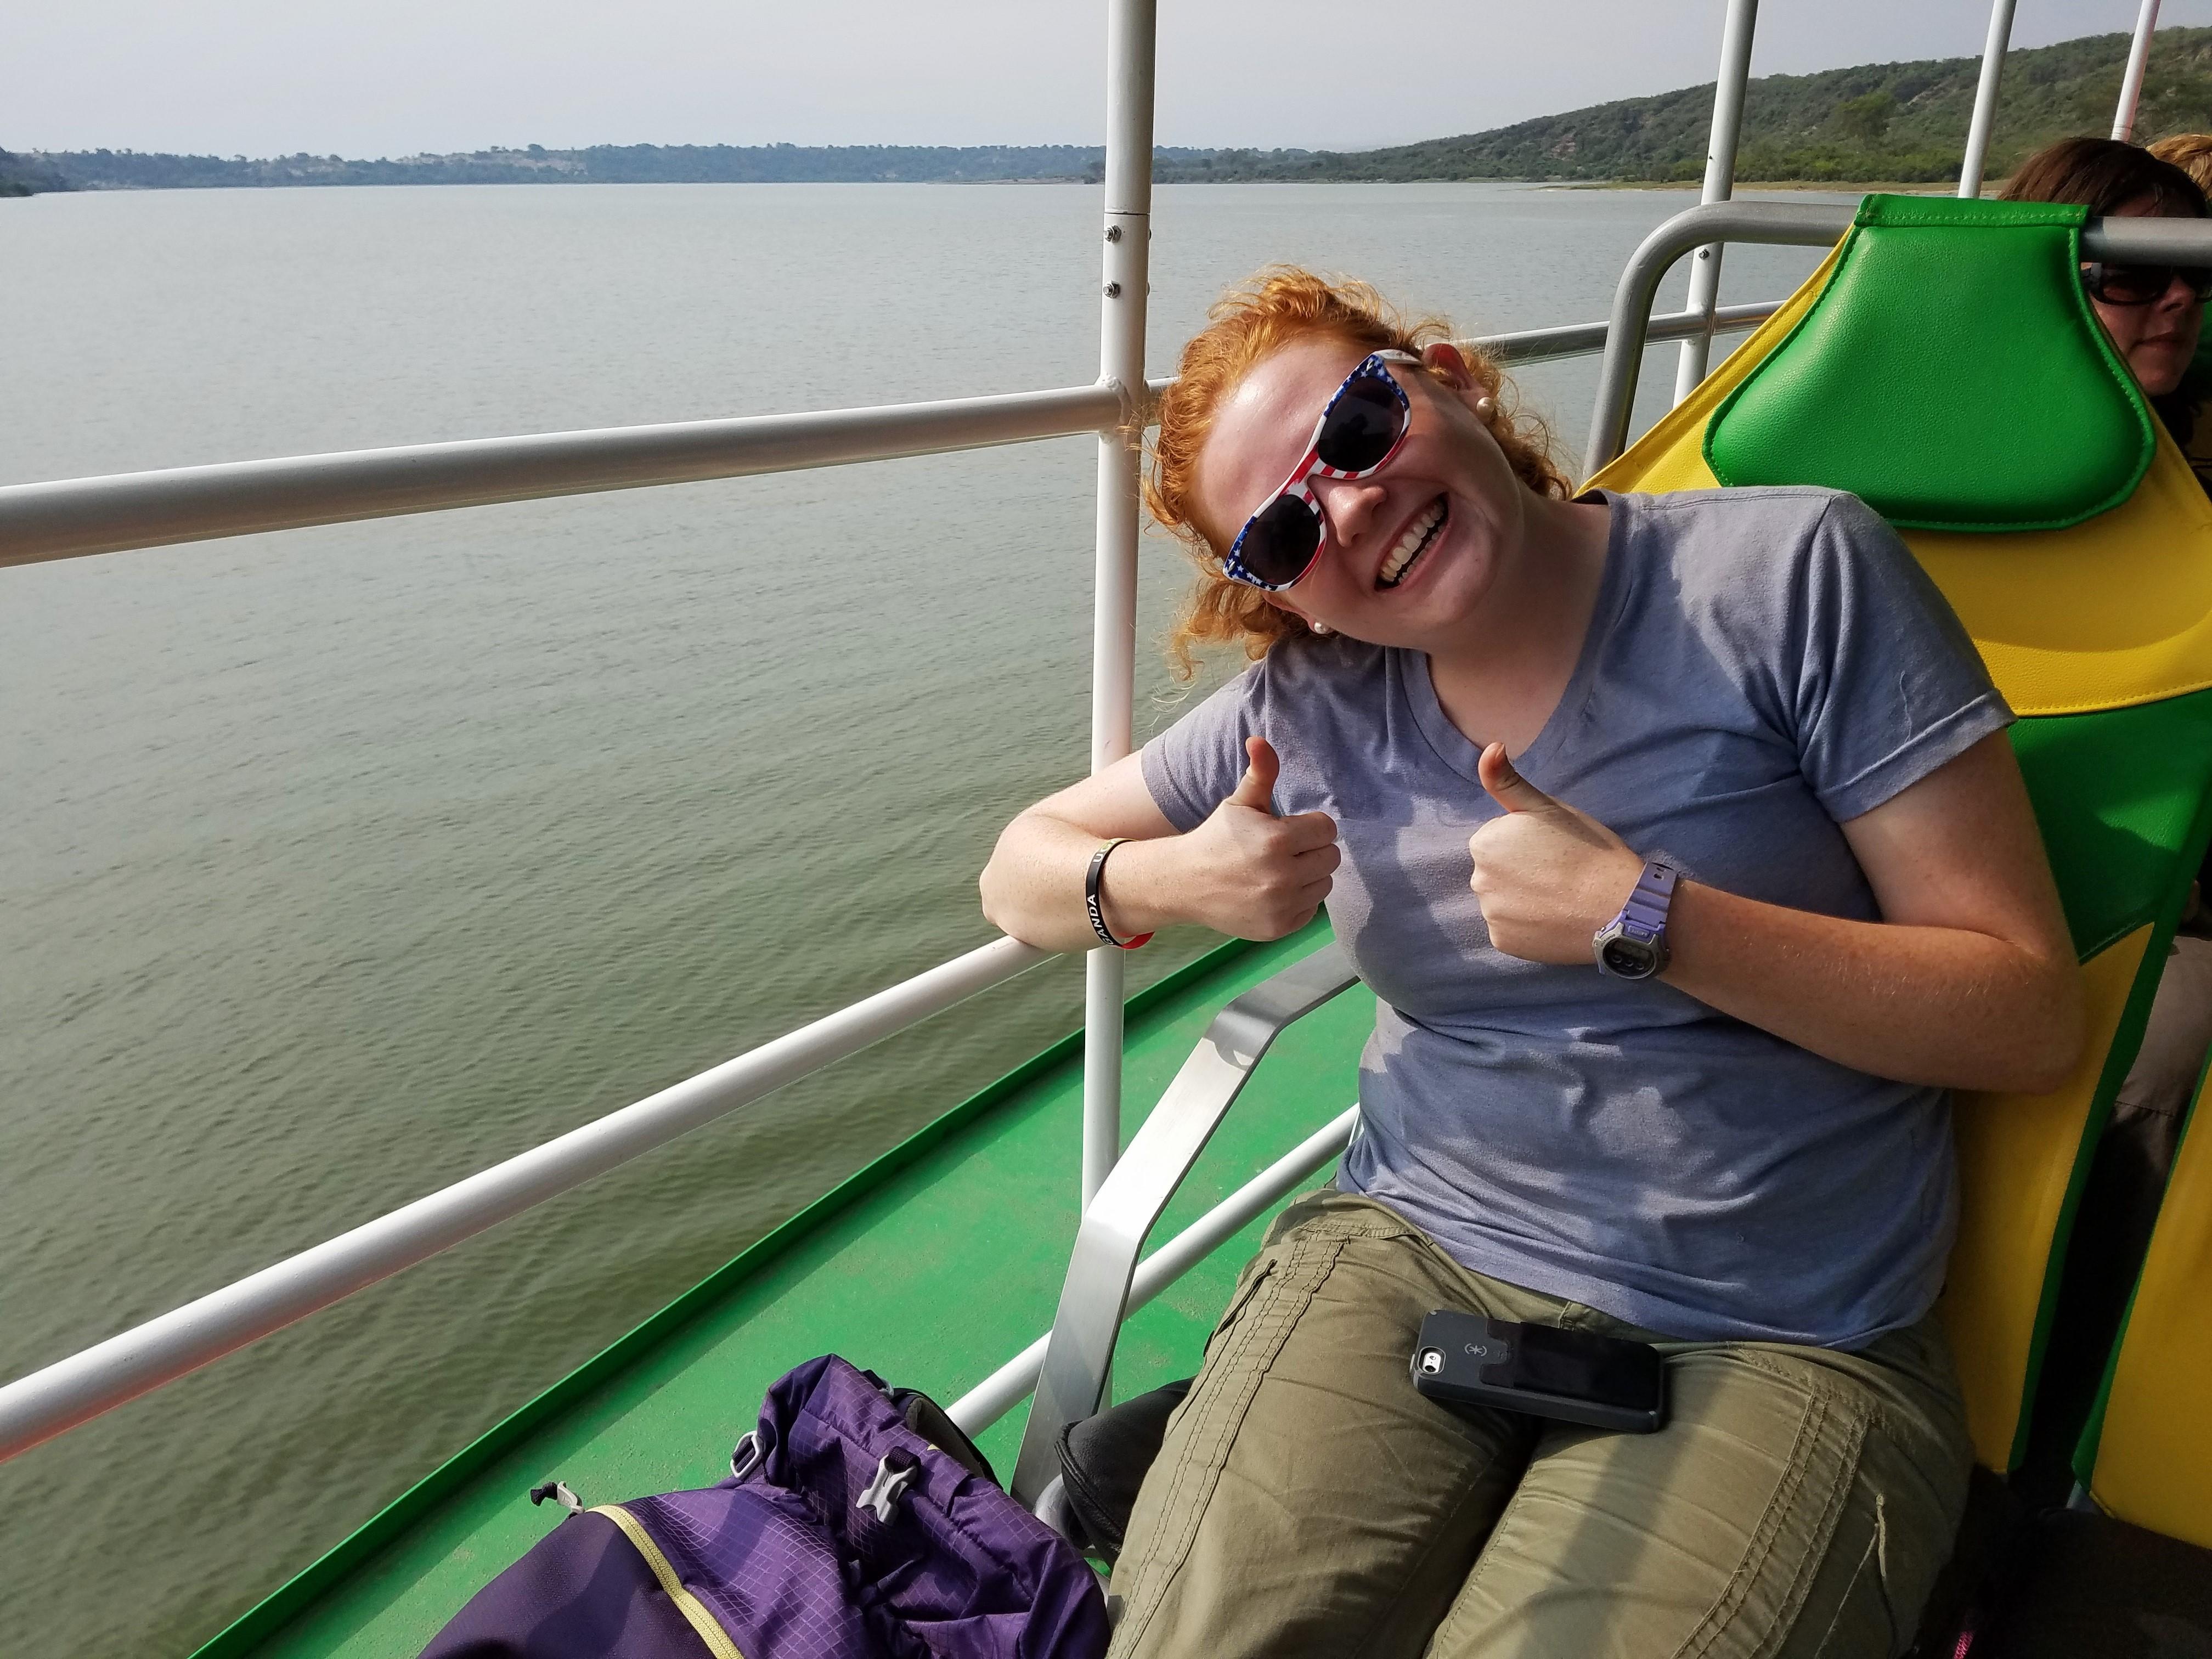 safari, Uganda, Red Chili, Queen Elizabeth National Park, boat, murica